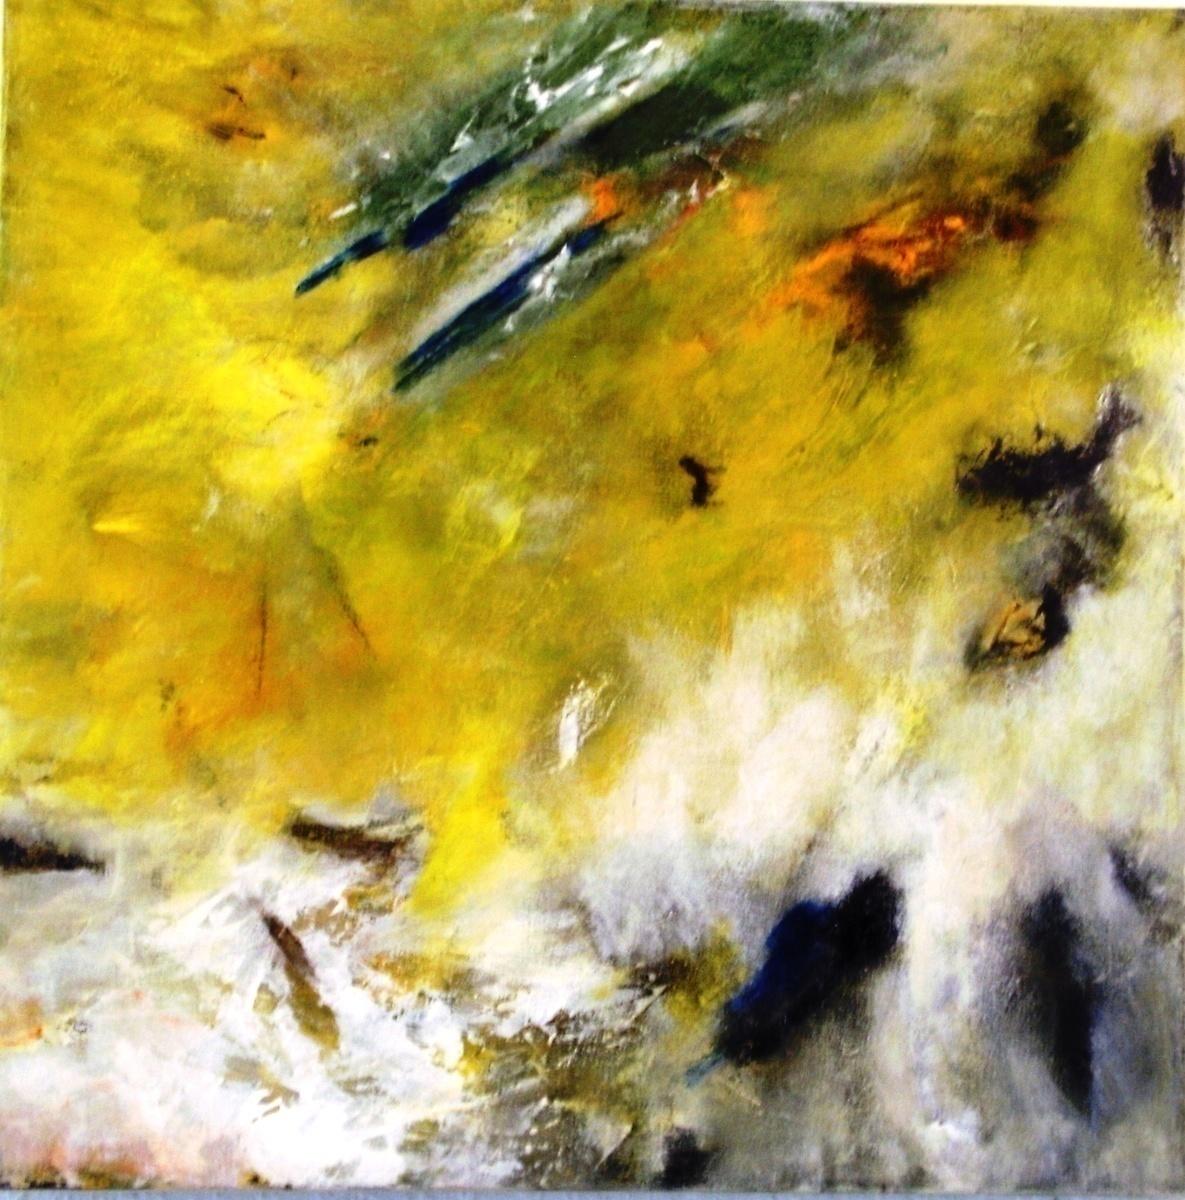 ohne Titel-gelb - Jakira